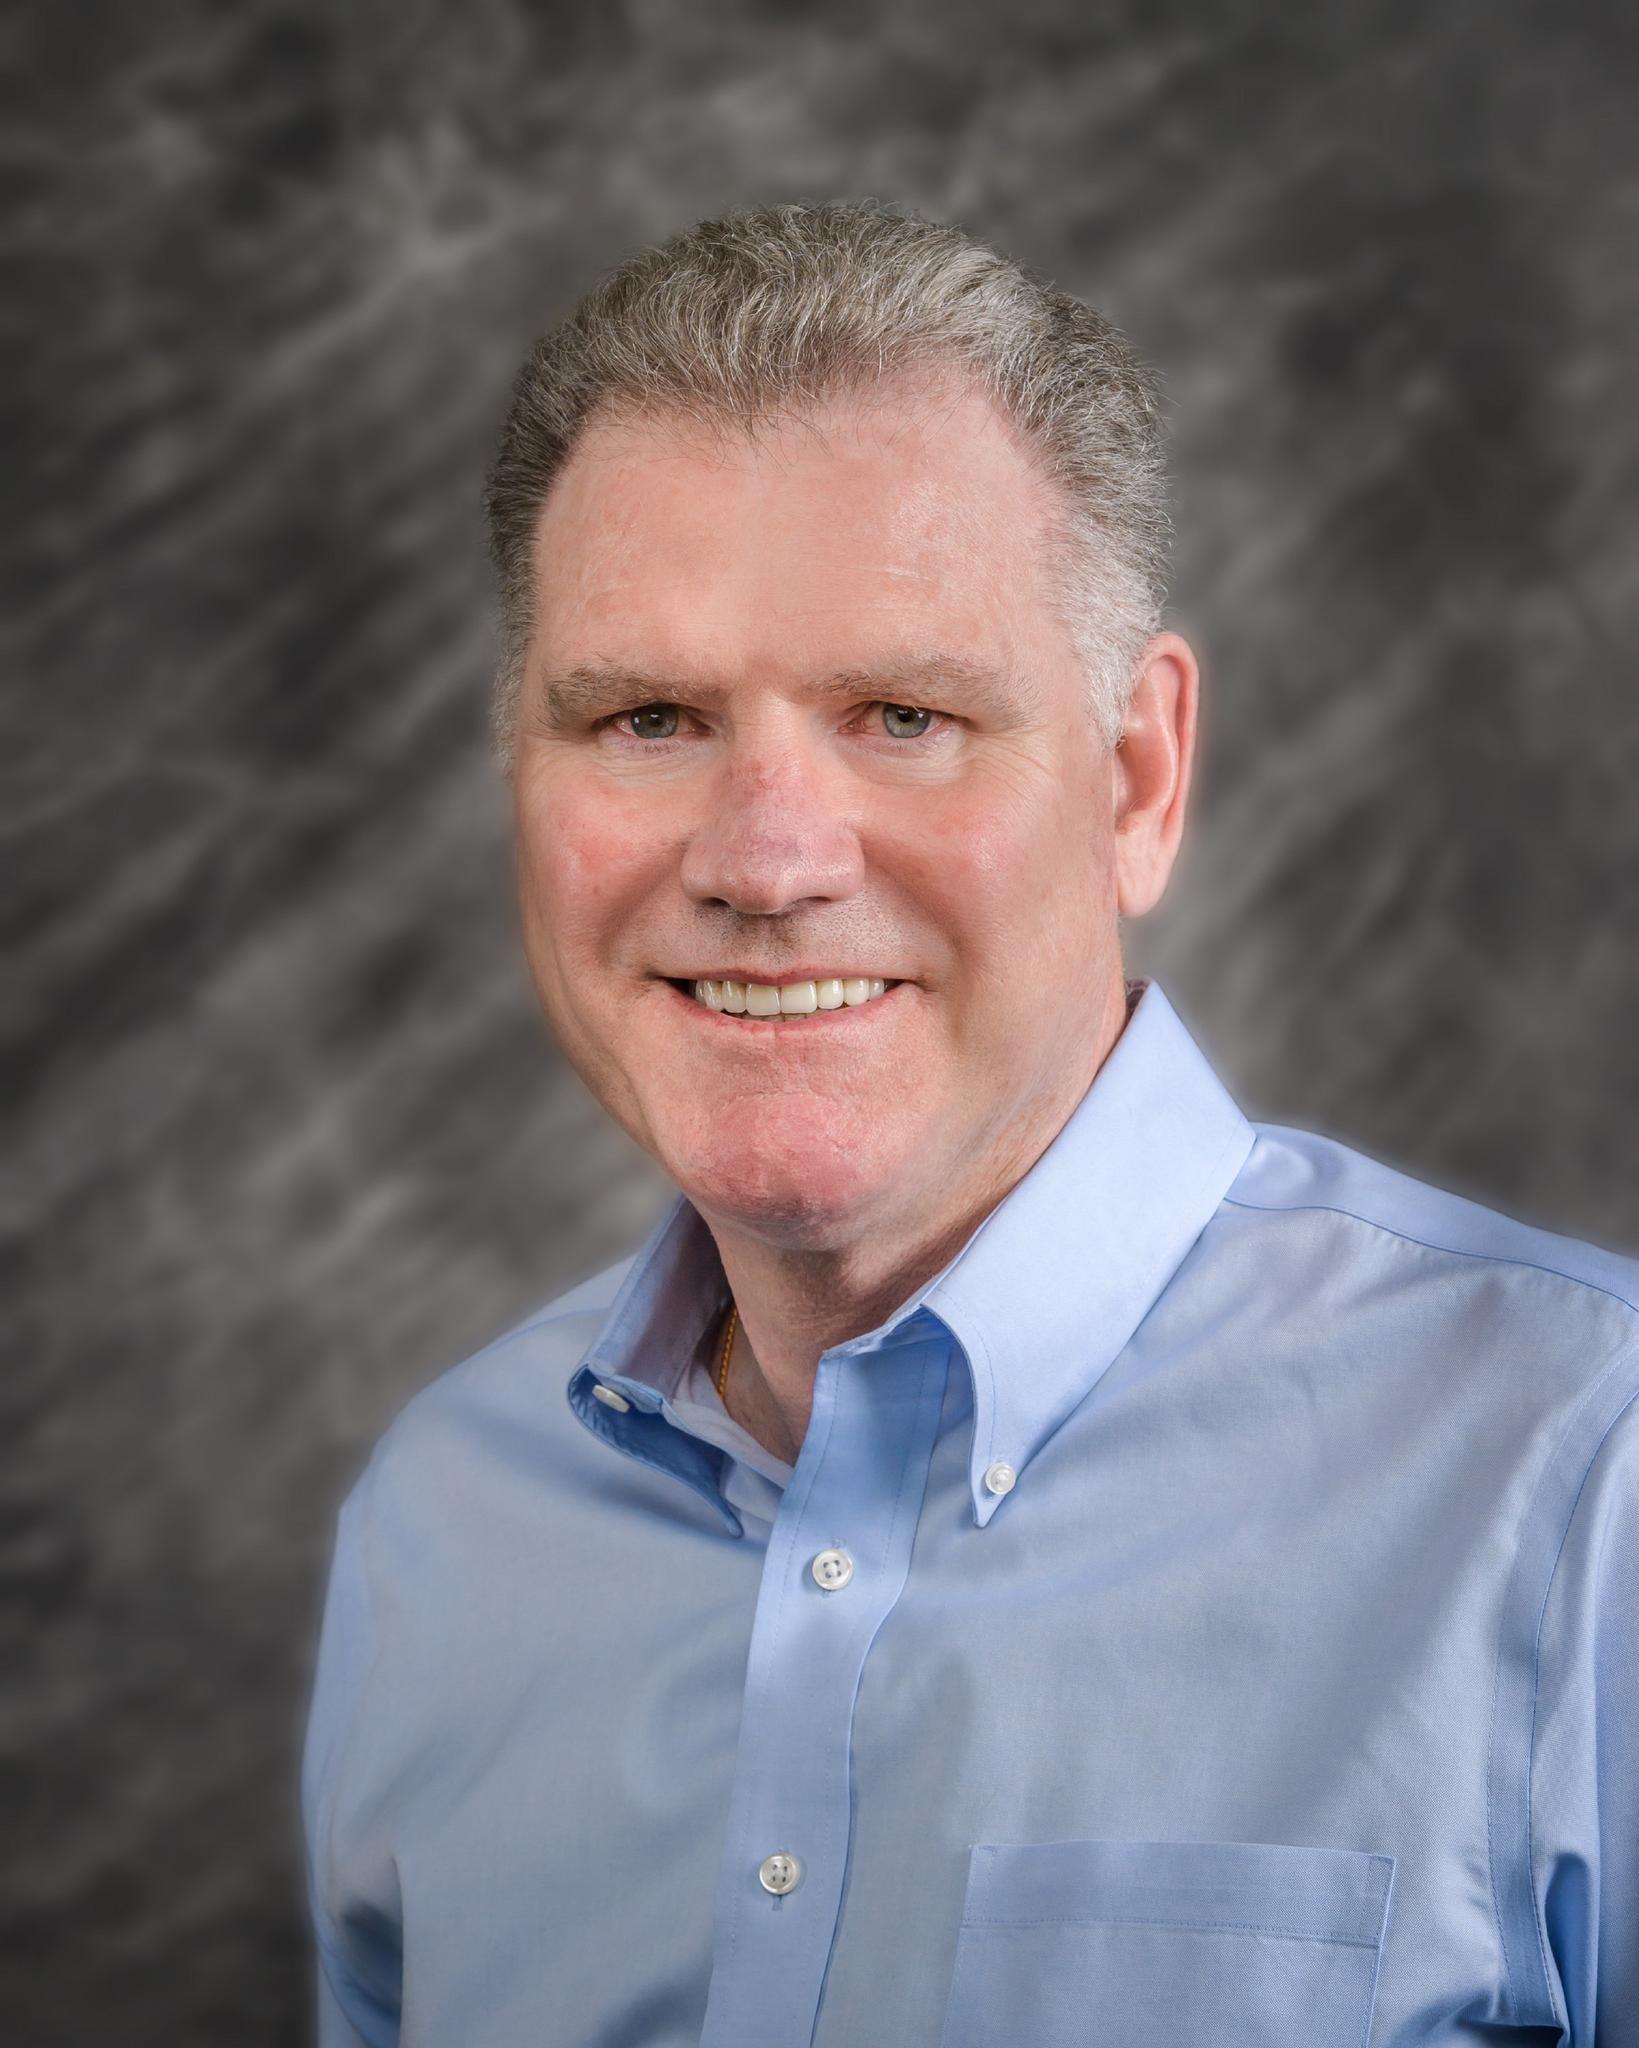 Craig Cipolla, Program Committee Chair